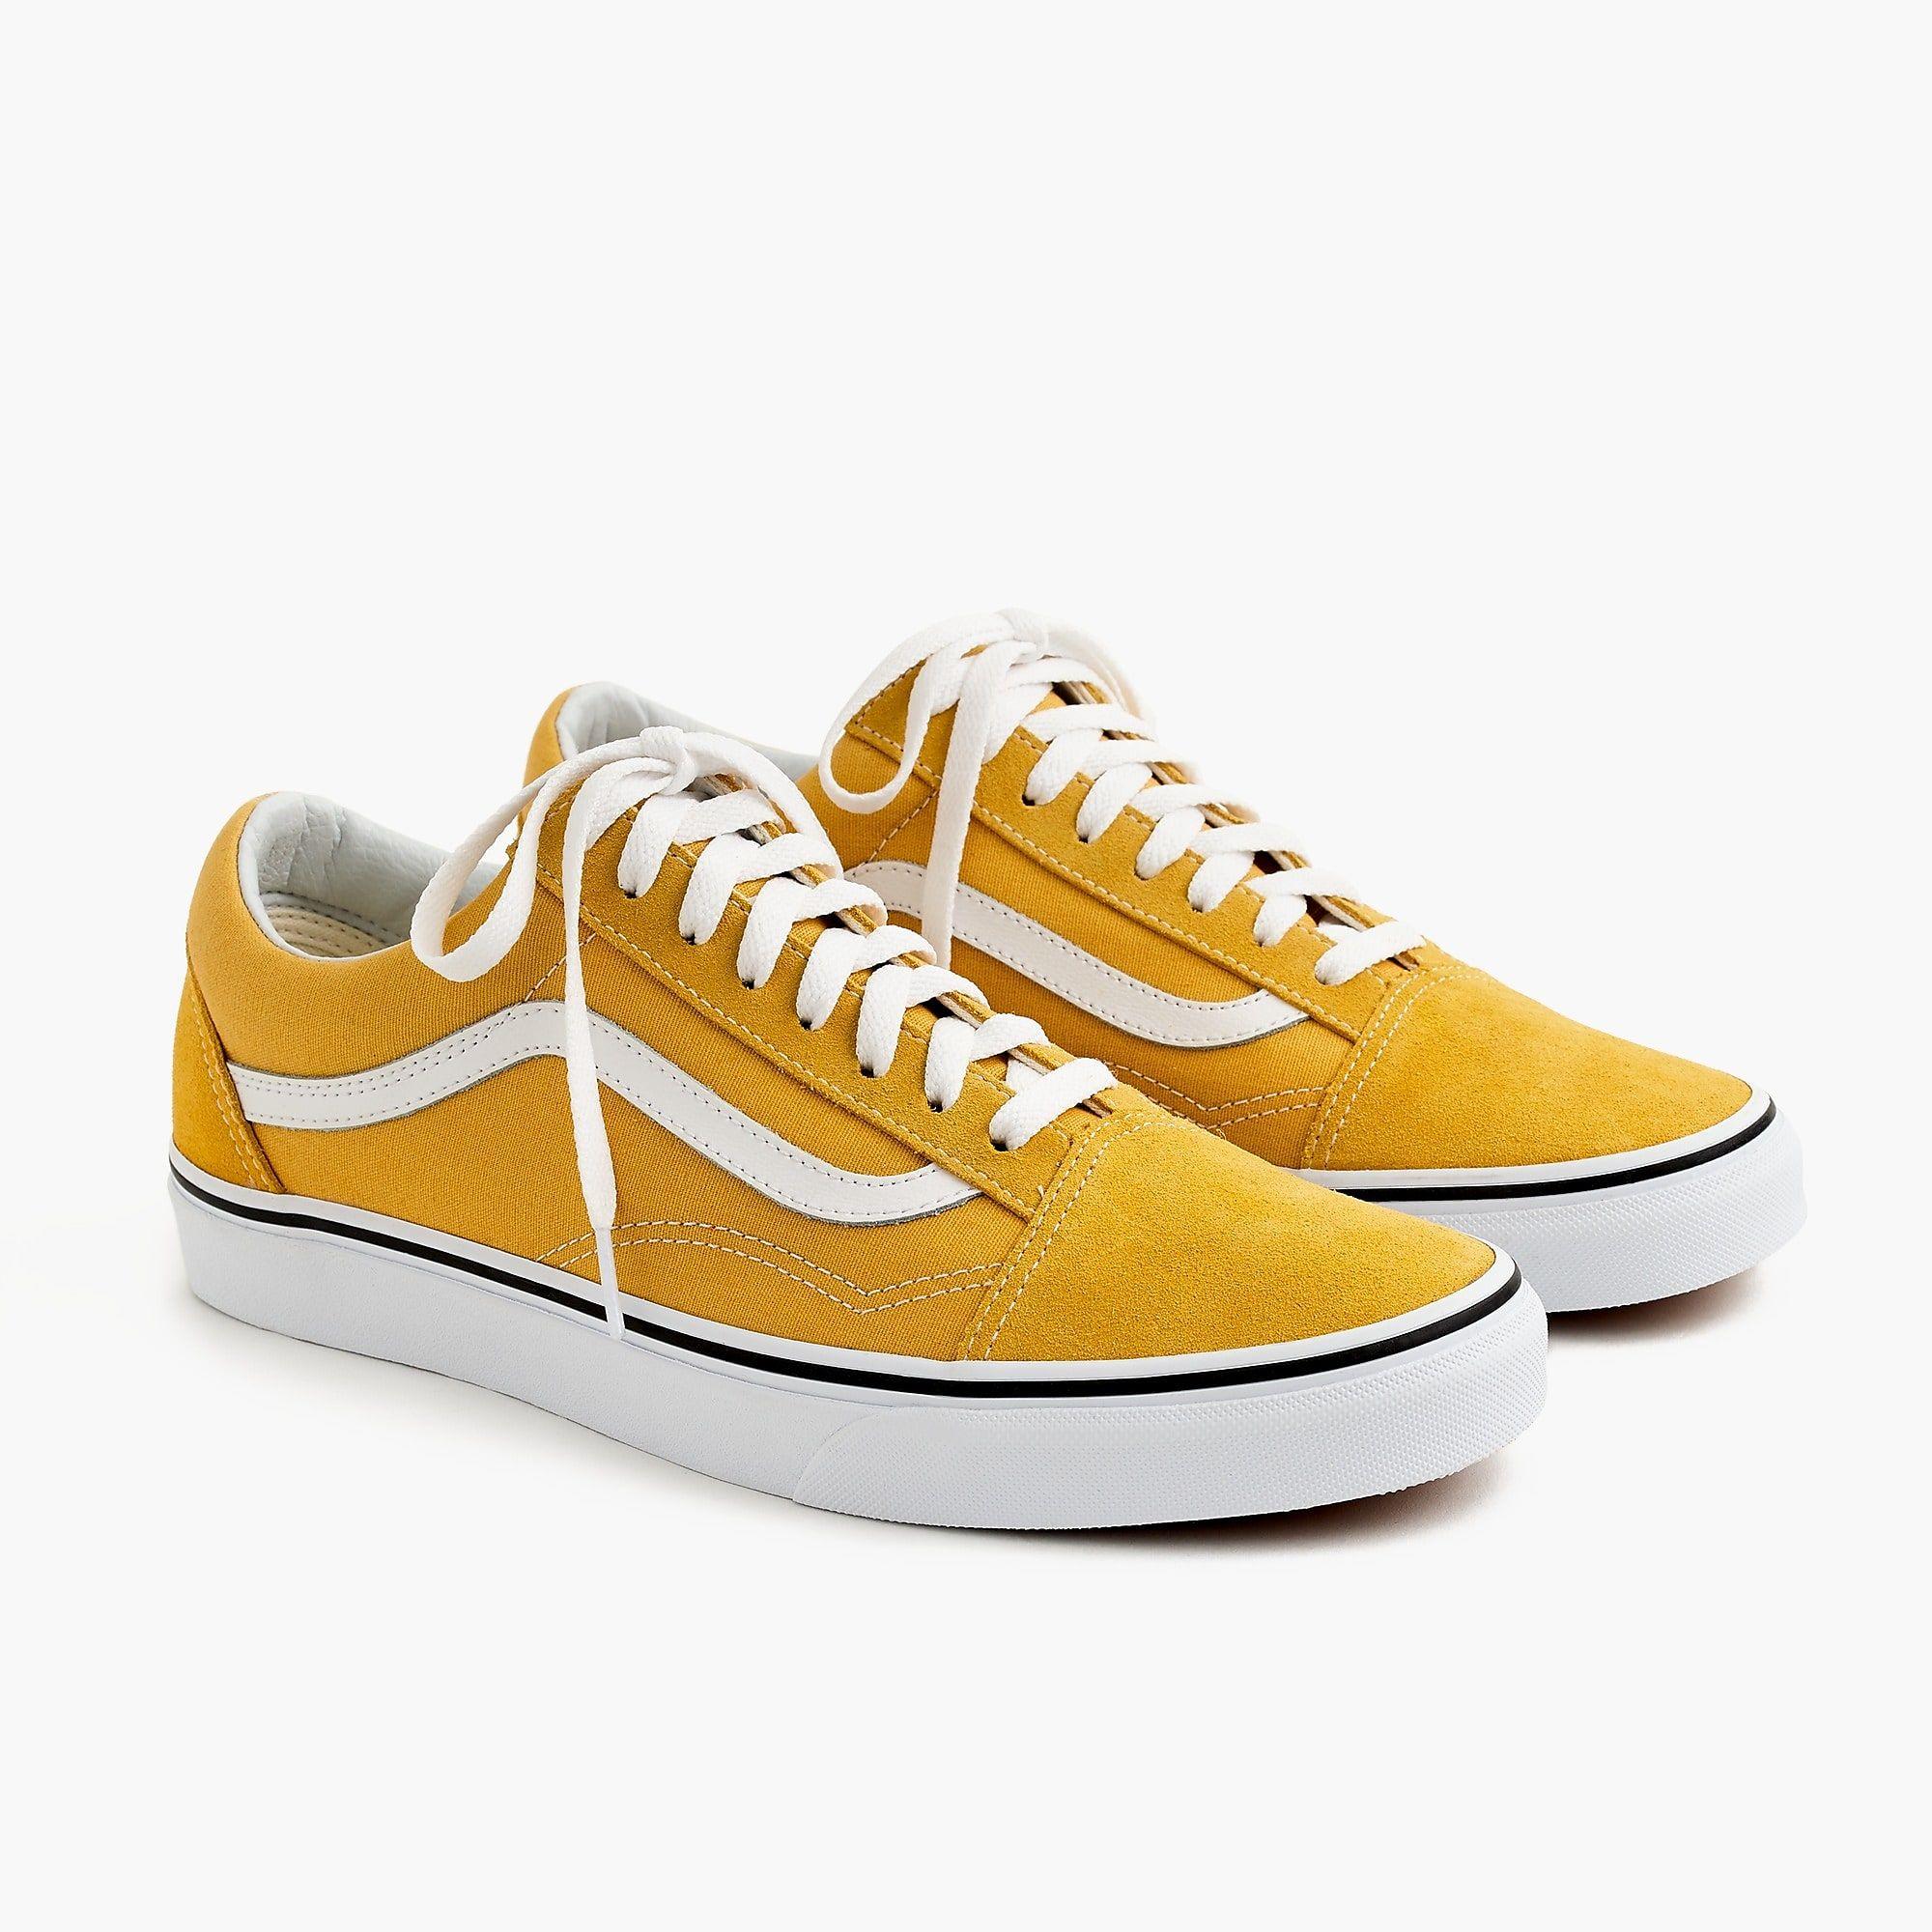 baskets femme vans jaune